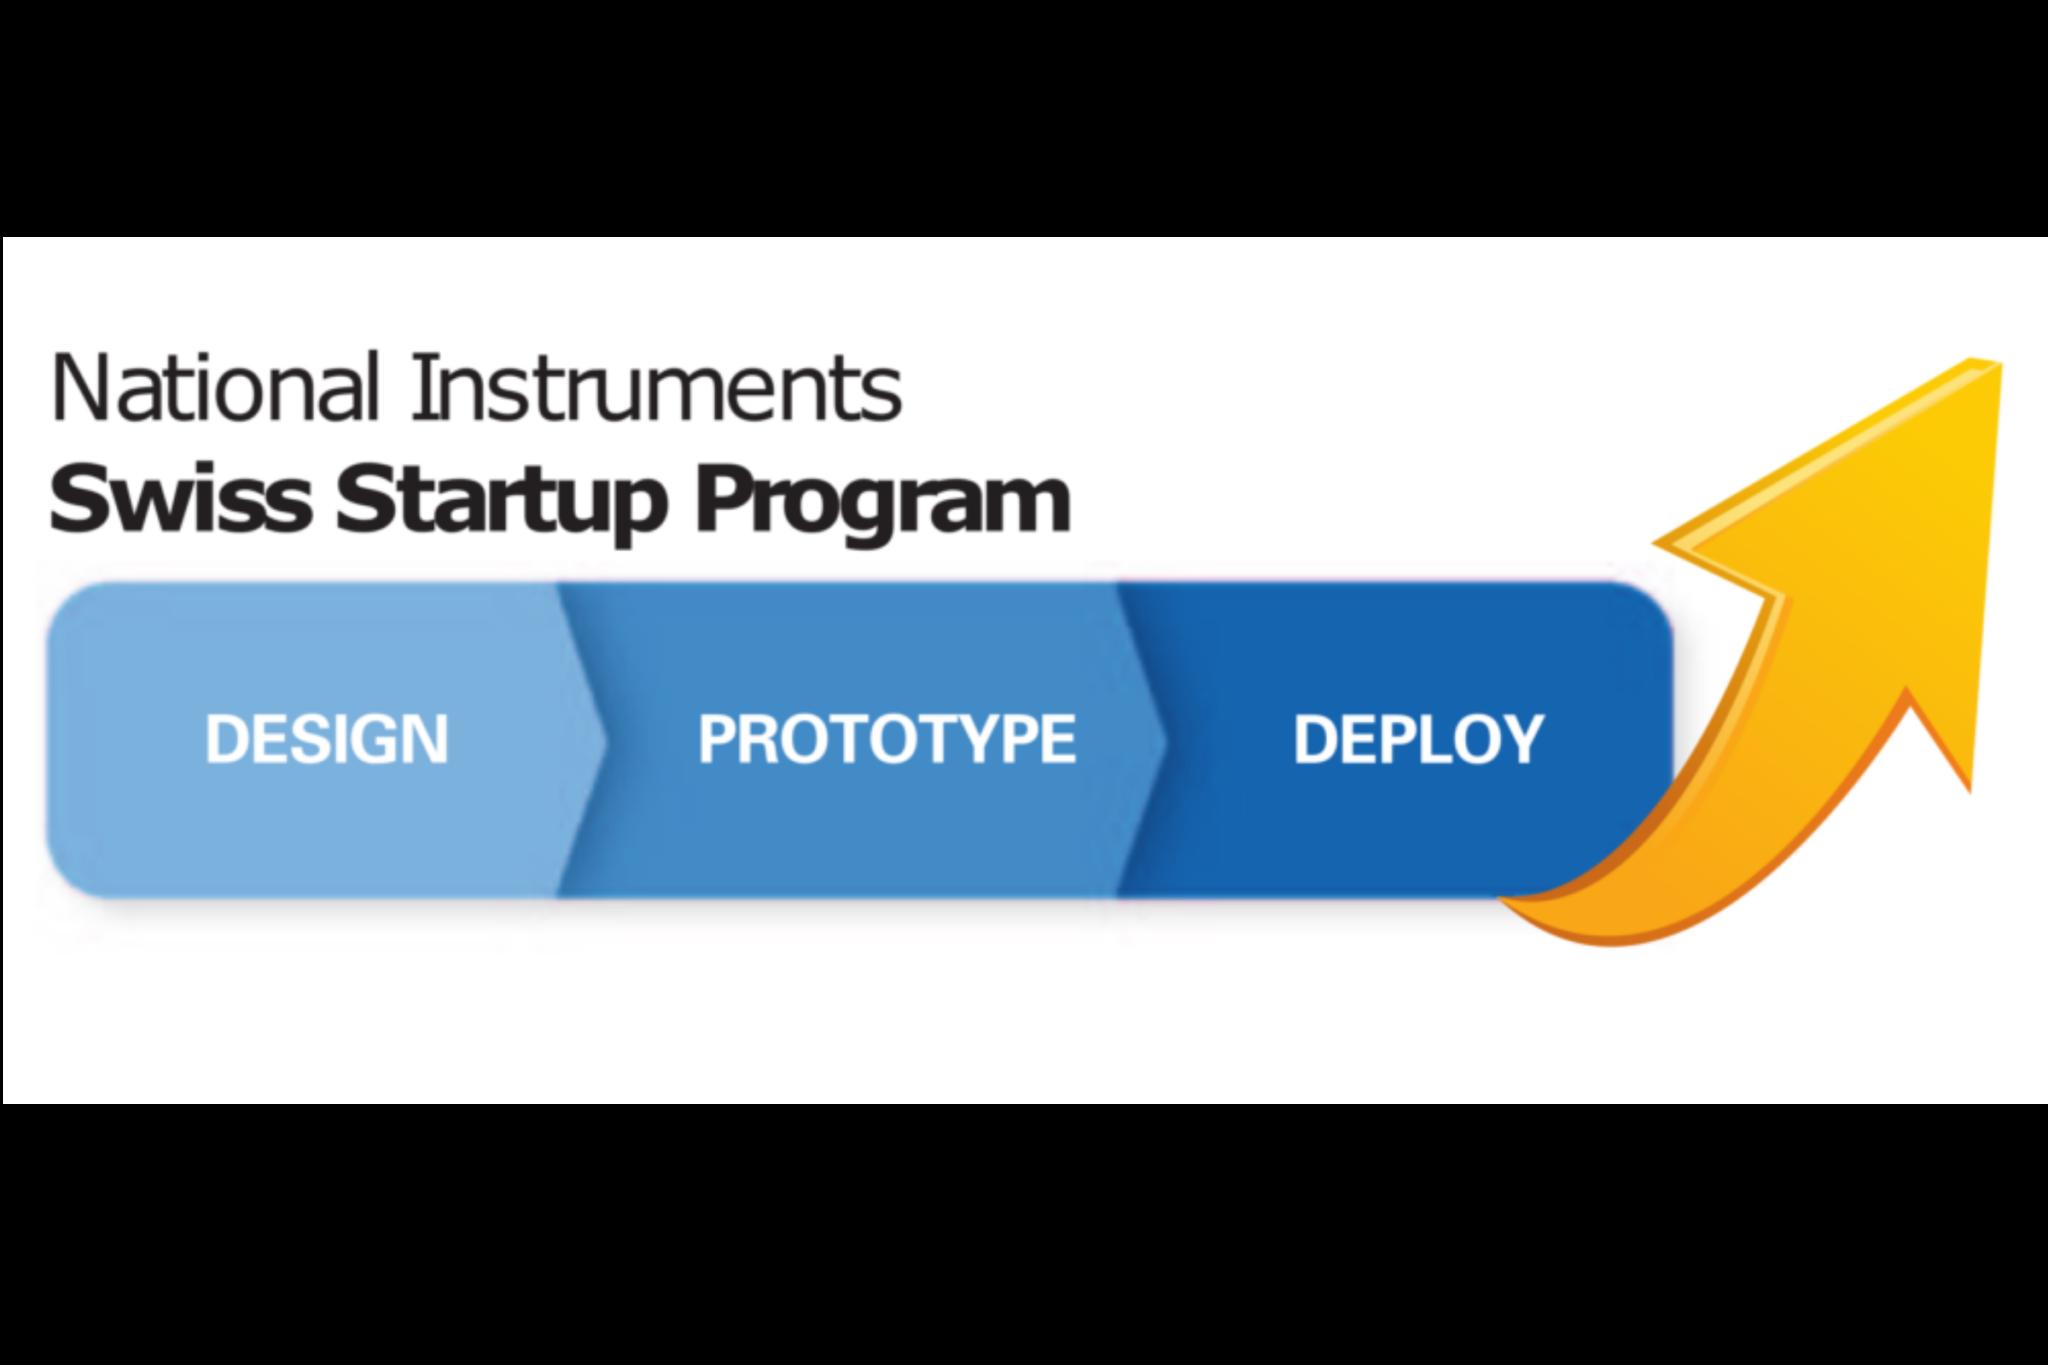 Zaphiro enters National Instruments Swiss Startup program.